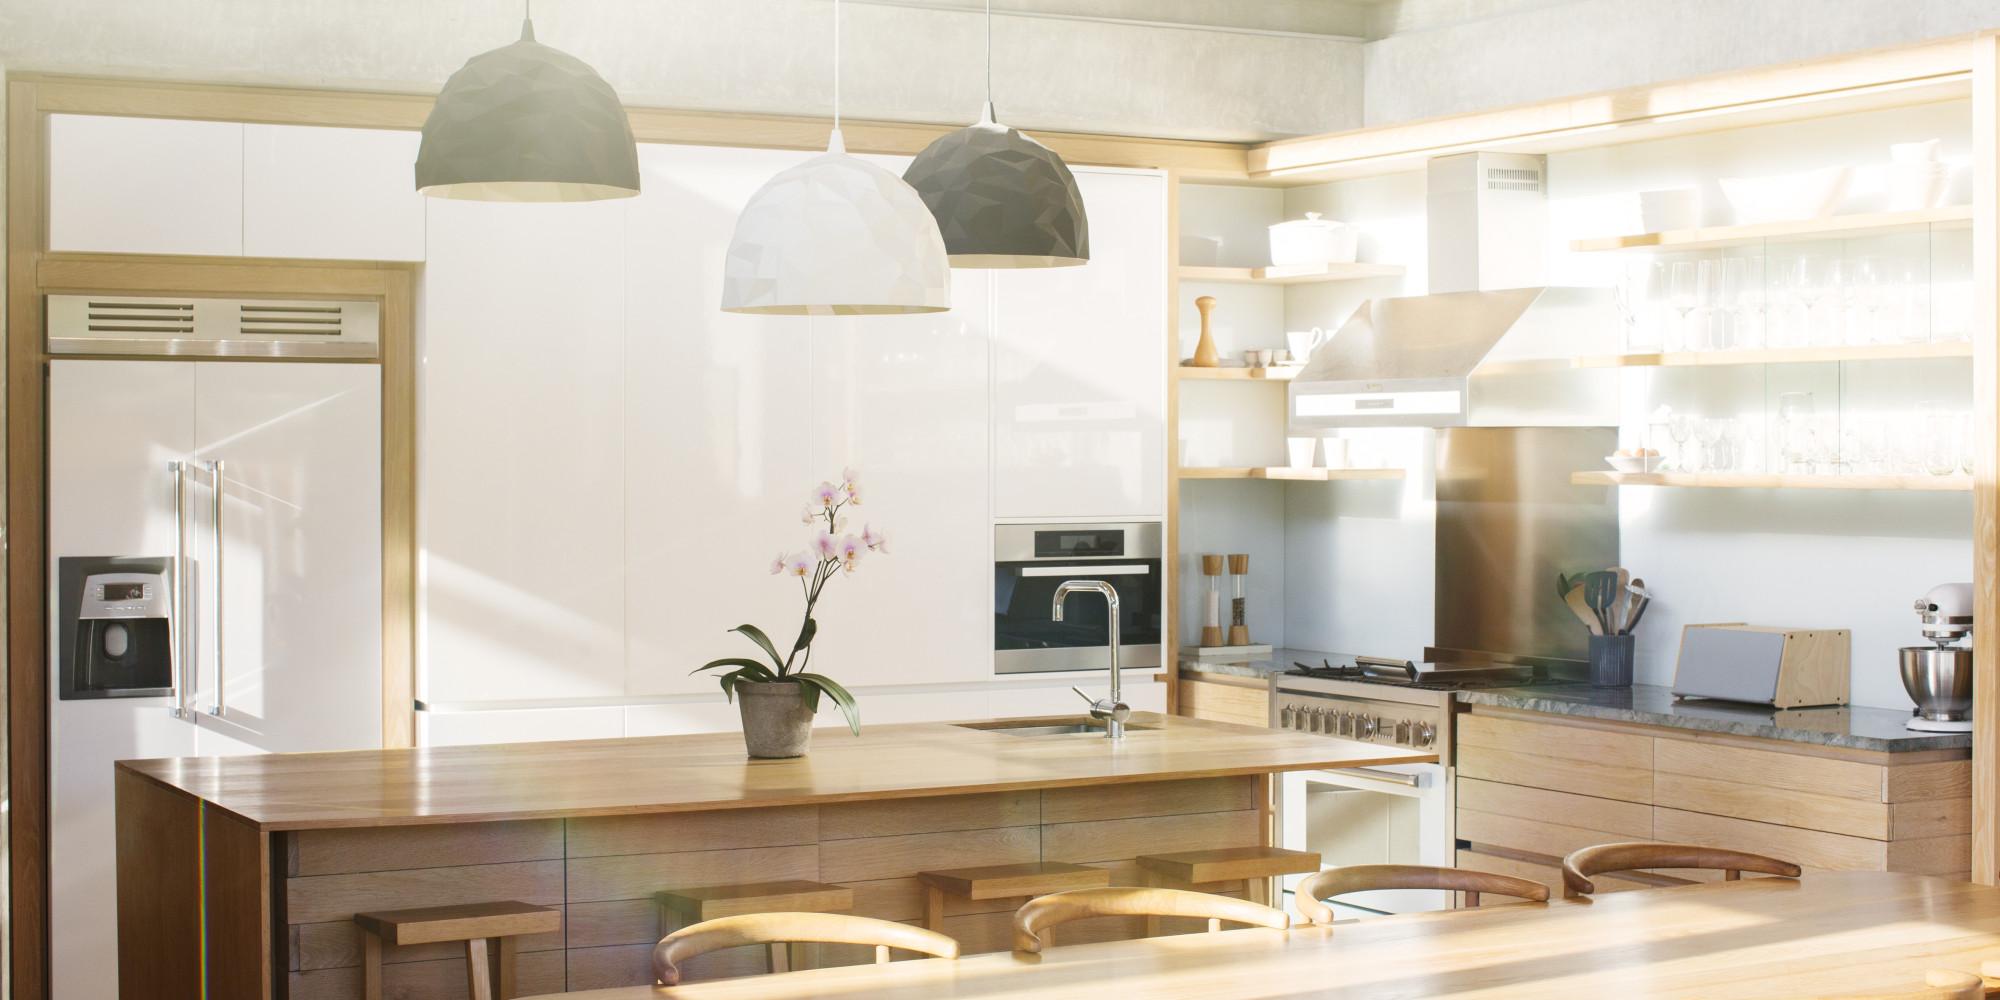 Home Decor Edmonton shangri la exotic home decor ltd photo Home Decor Jobs Edmonton Best 2017